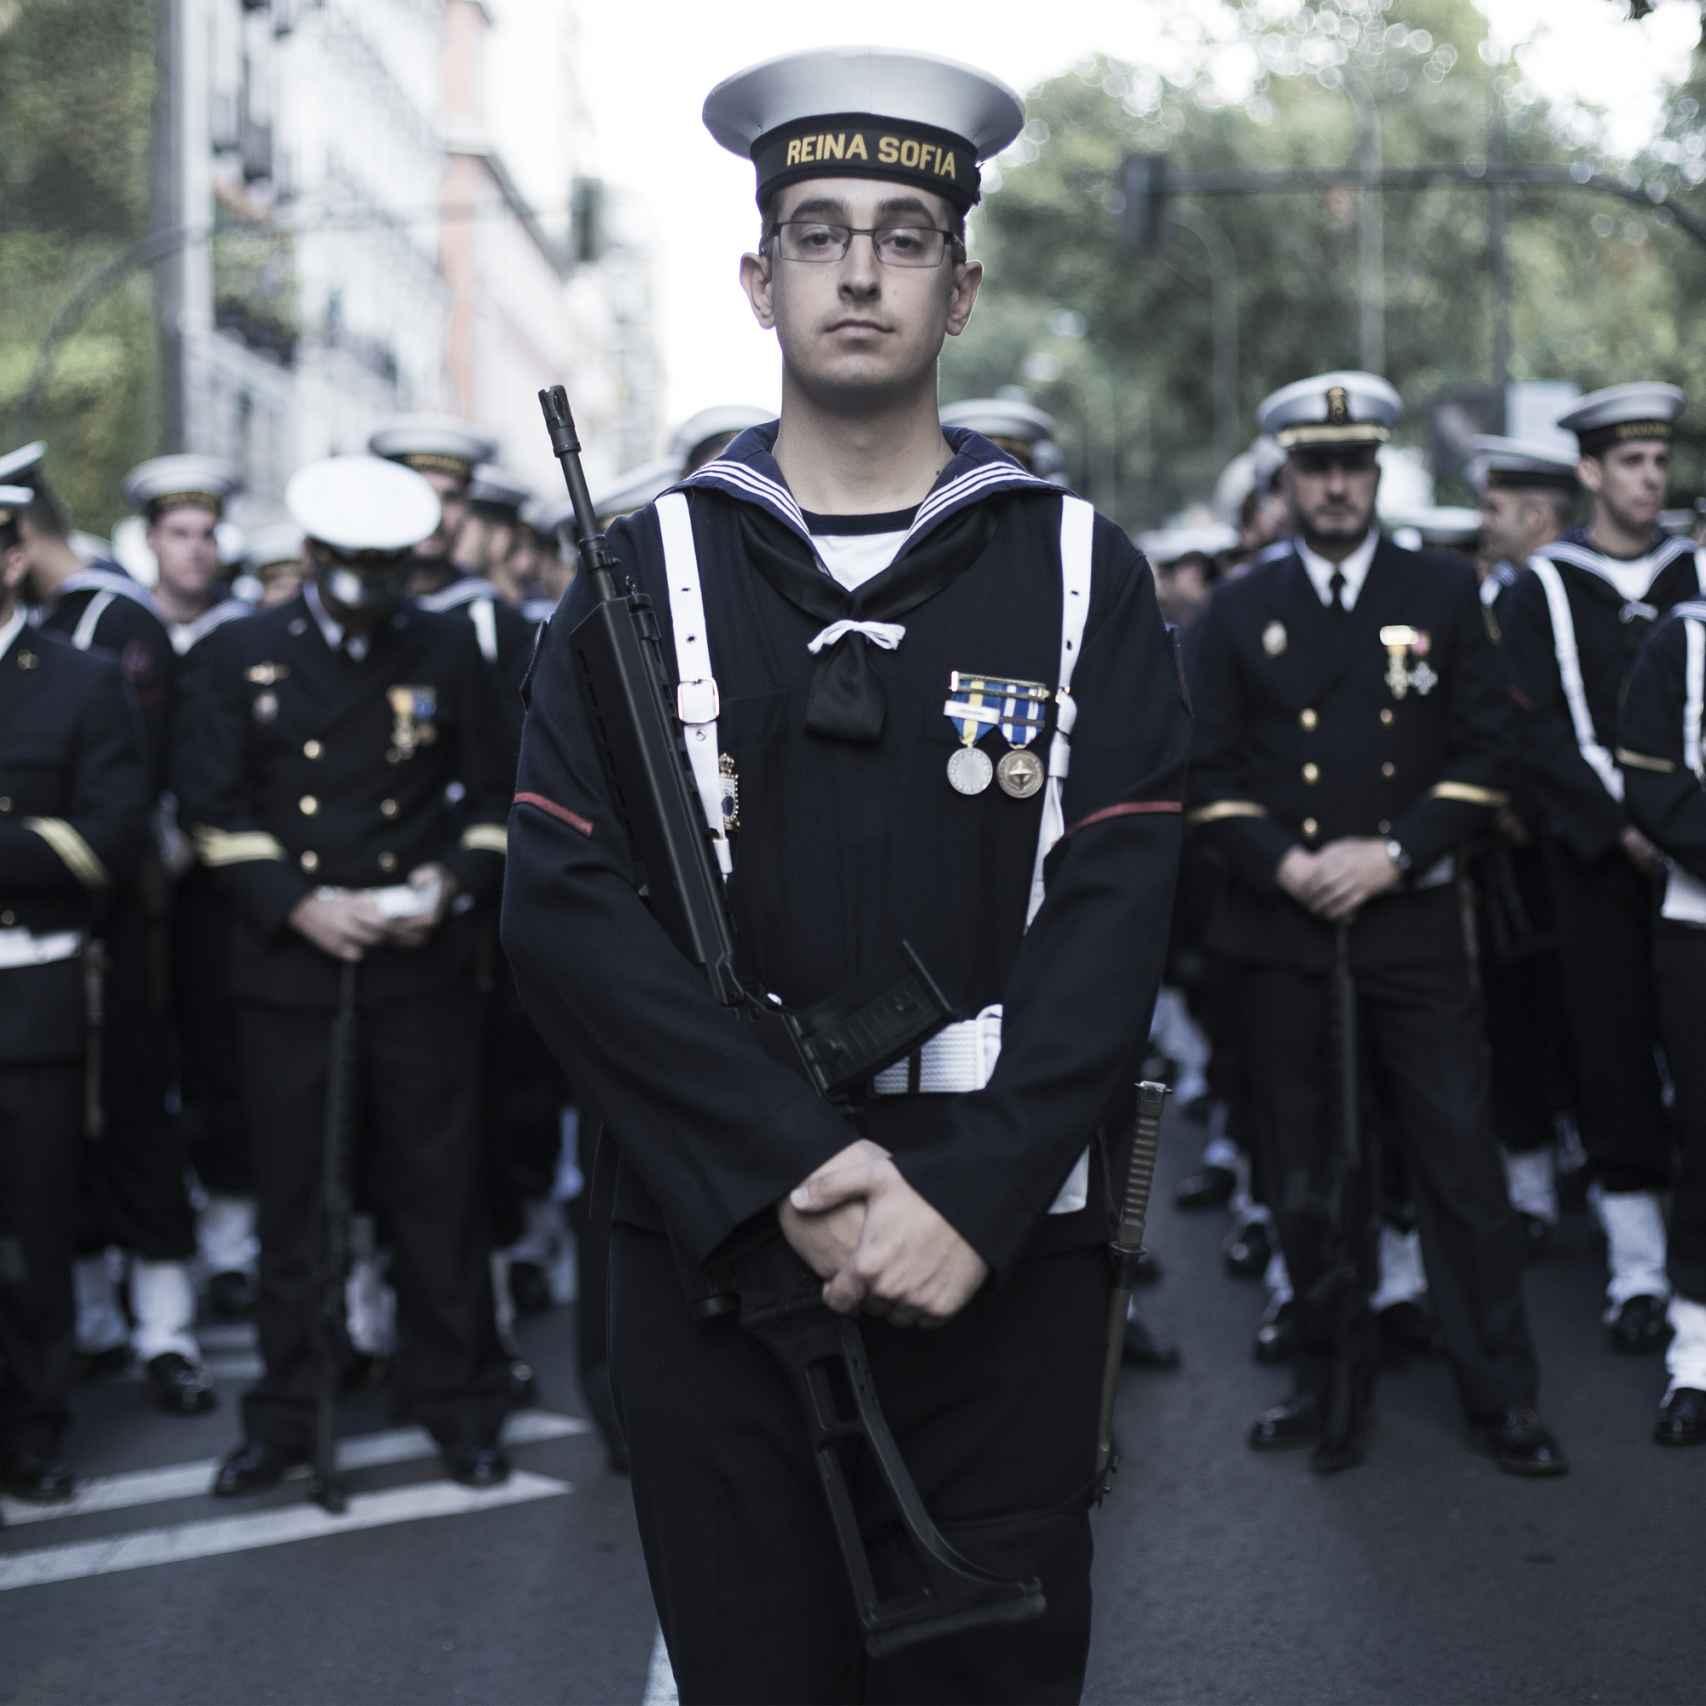 Víctor Lallana, marinero de la Flota de la Armada.